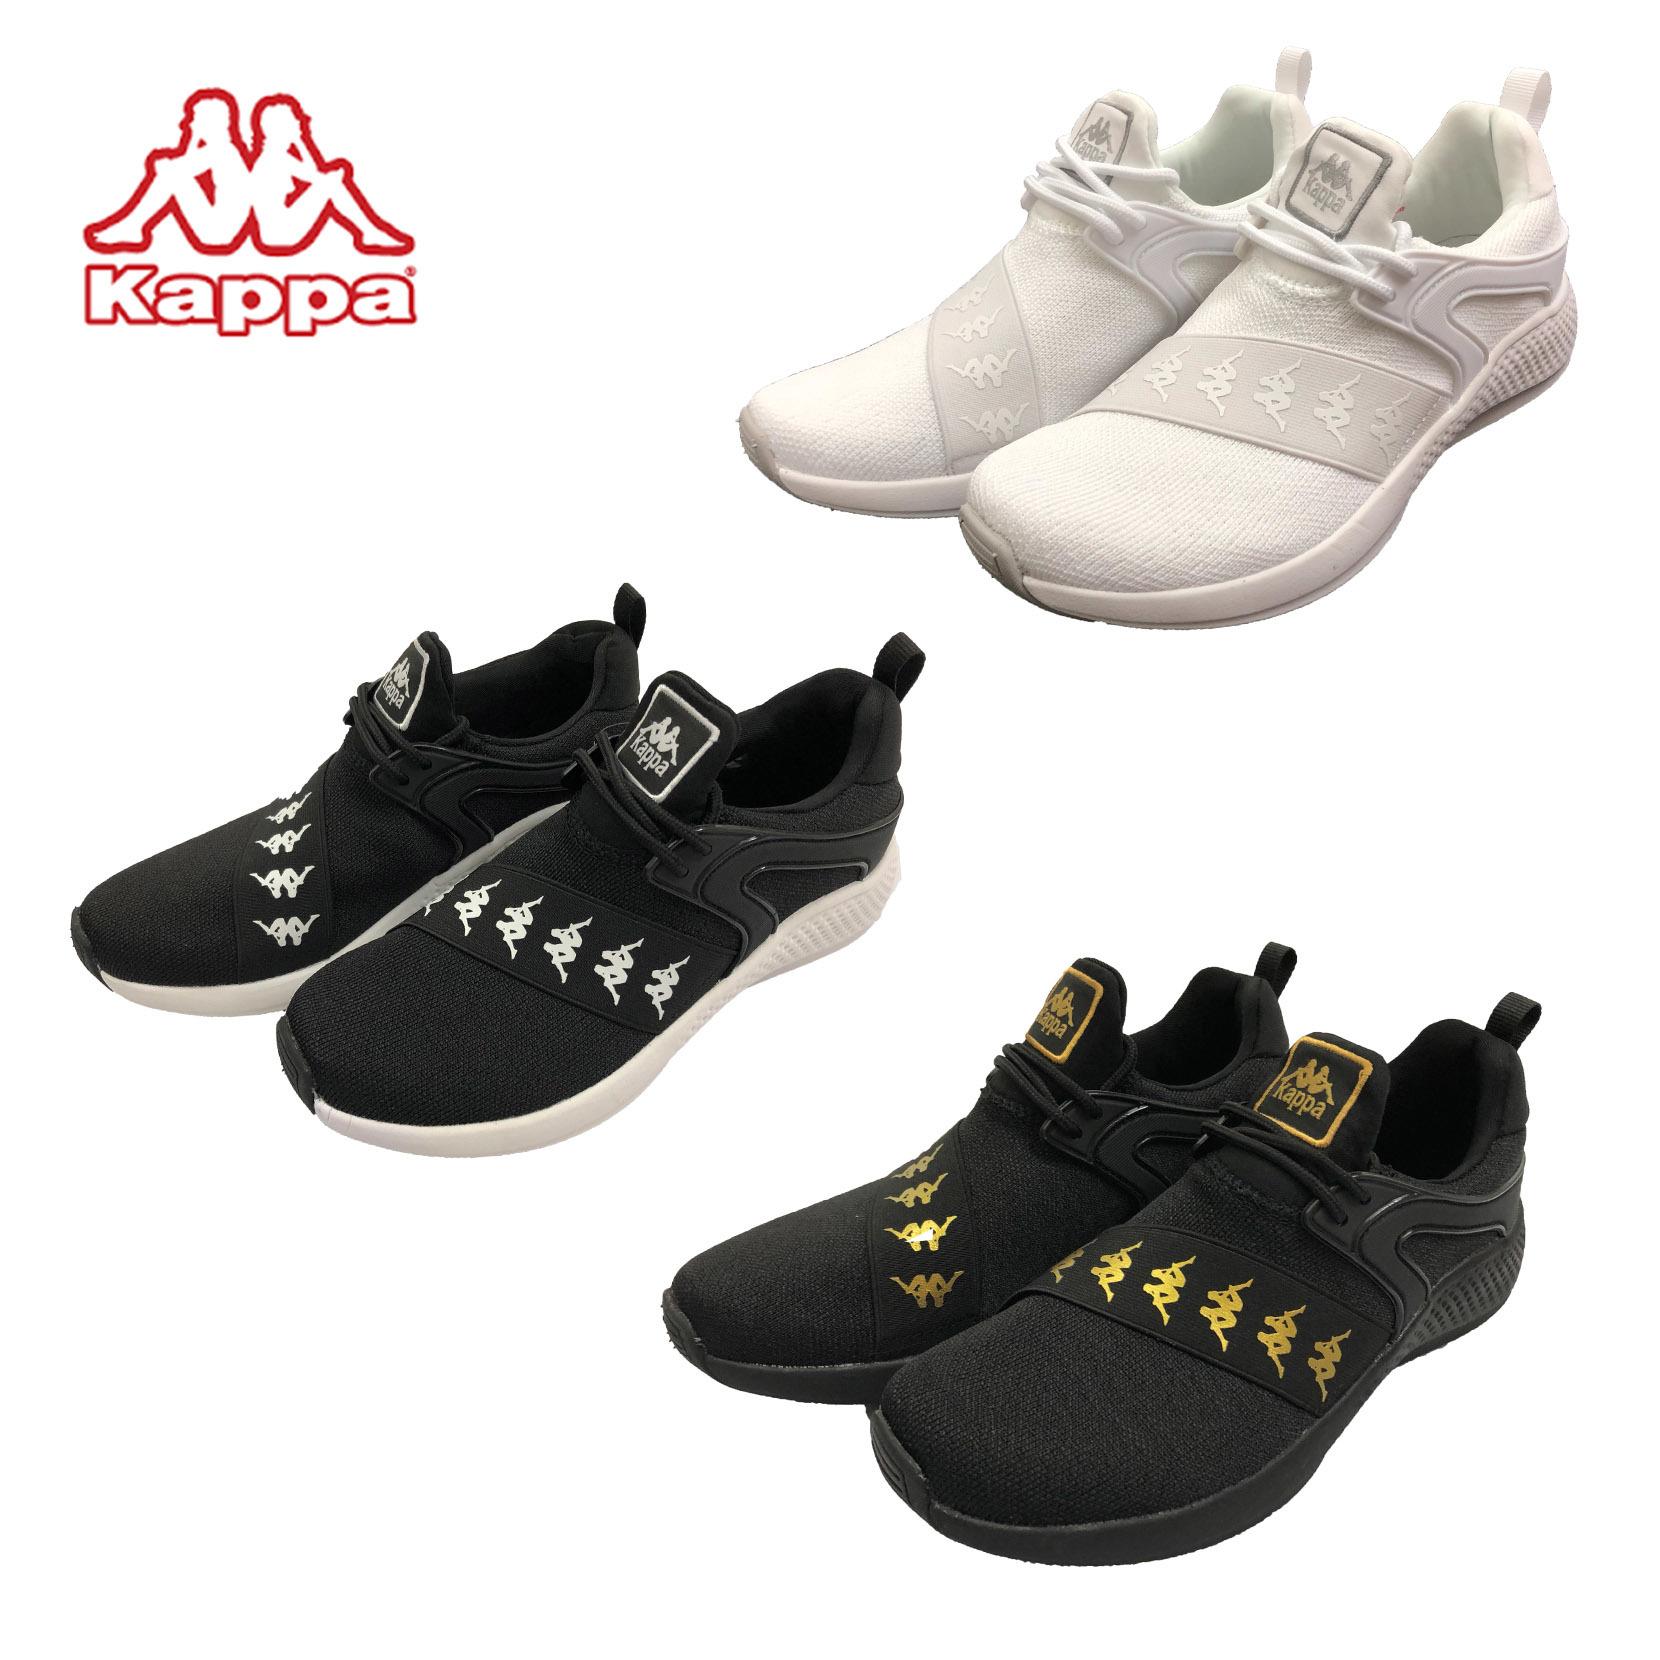 c496a8f27c7 Qoo10 - Kappa Sneakers : Men's Bags & Shoes